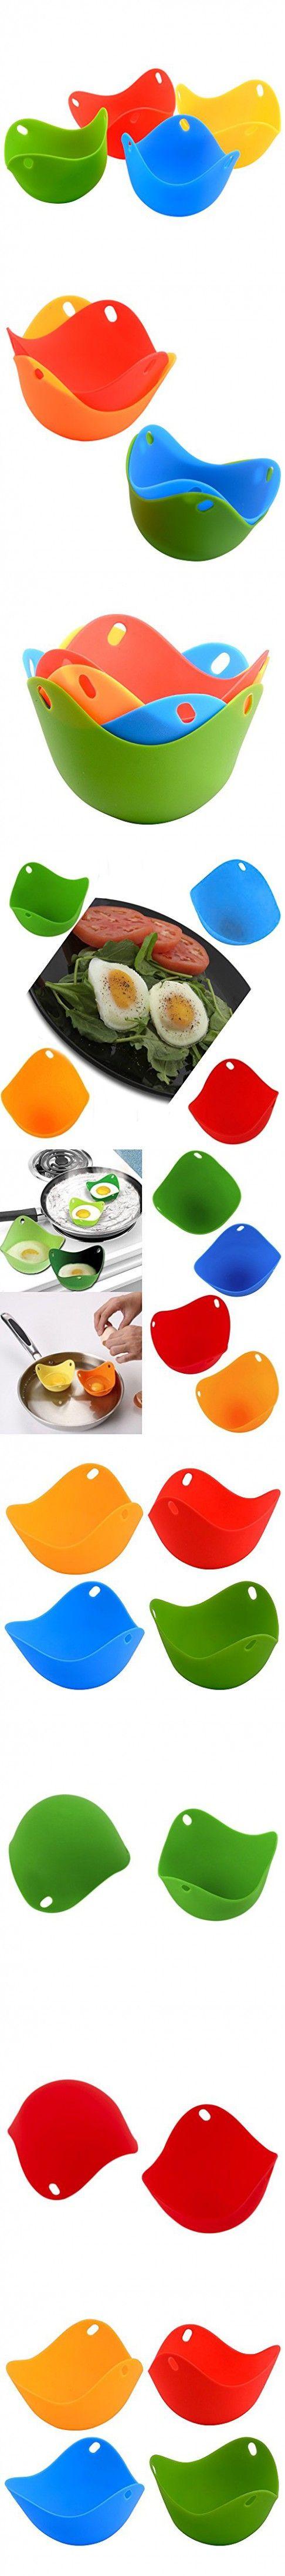 ETopLike Silicone Egg Poacher - Set of 4